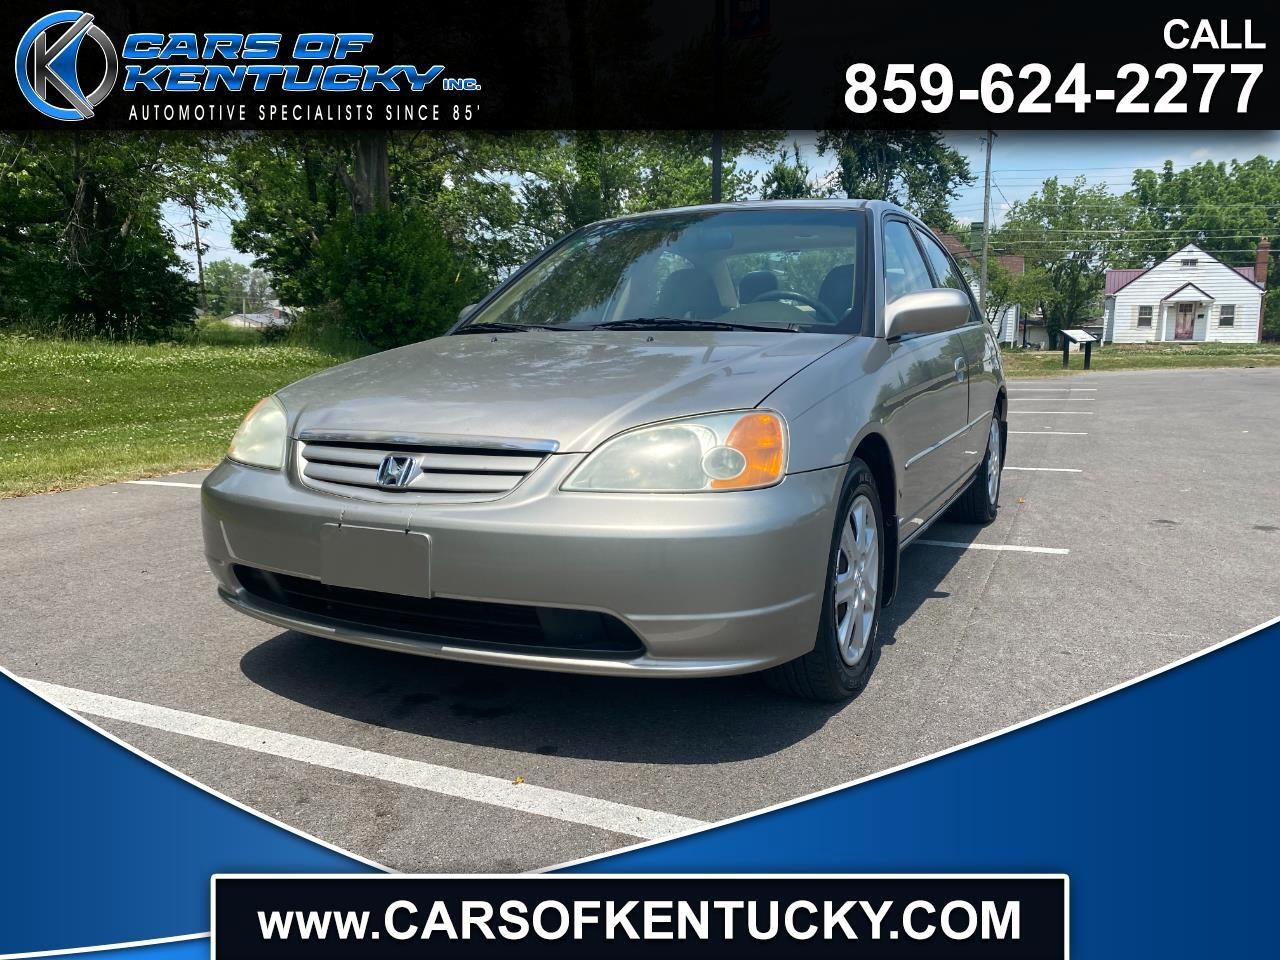 Honda Civic 4dr Sdn EX Auto 2003